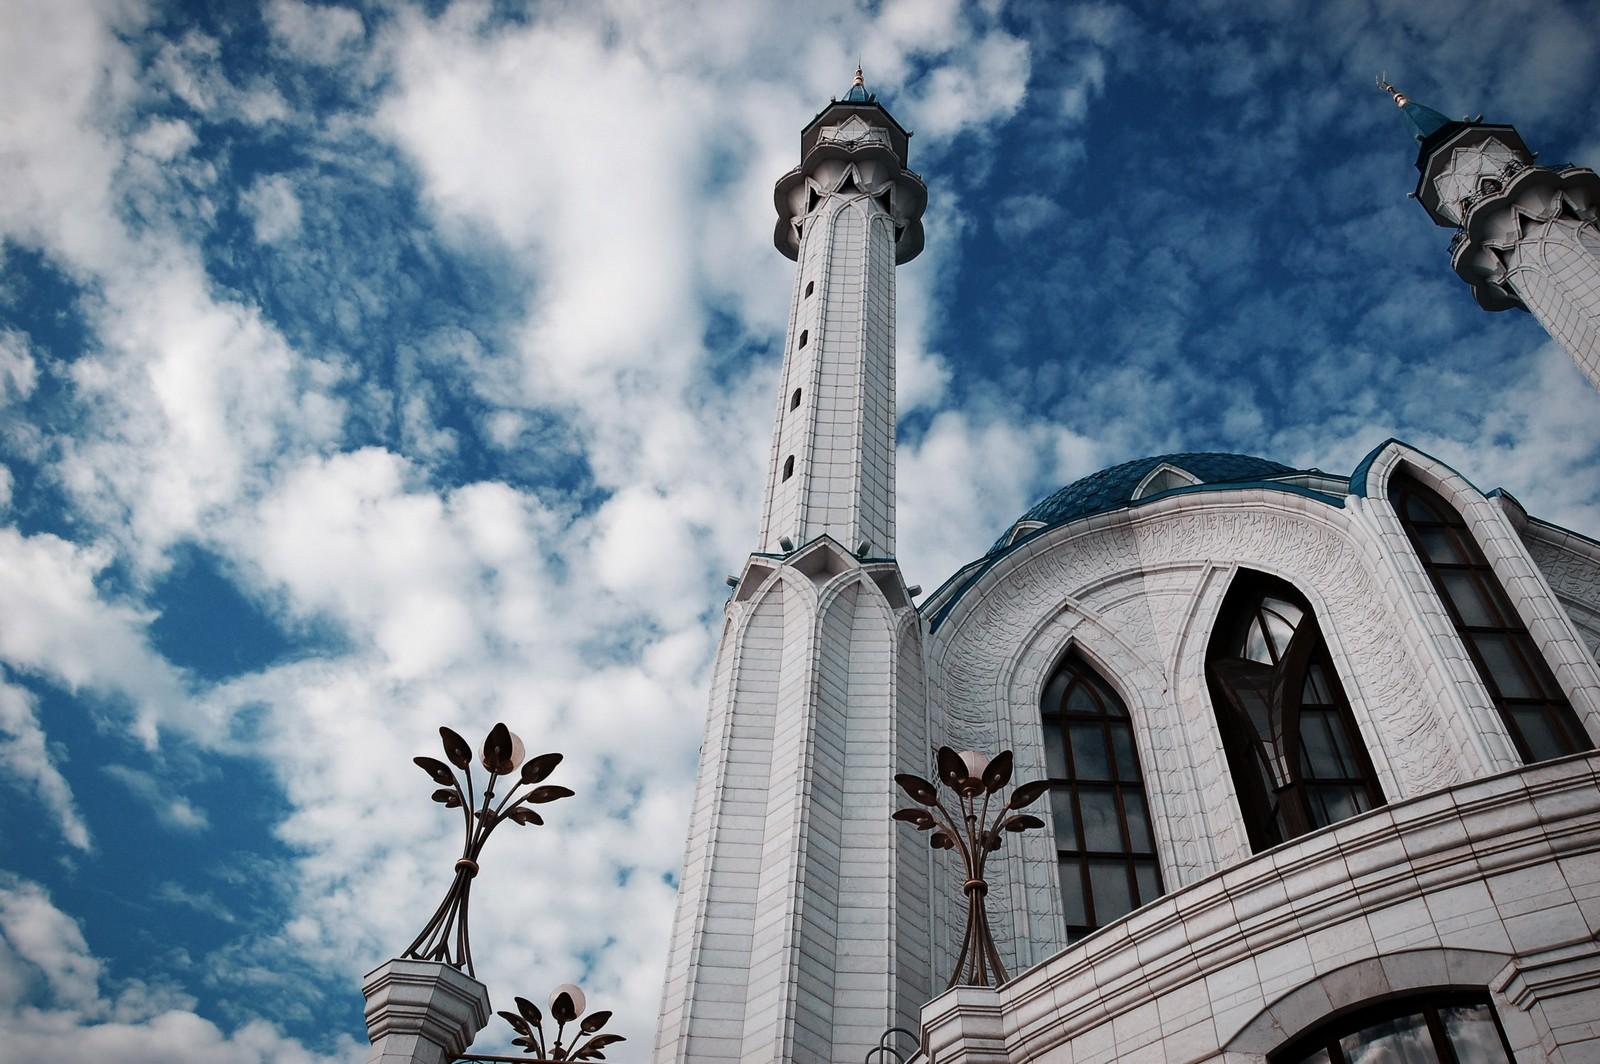 Мечеть Кул-Шариф, фрагмент фасада